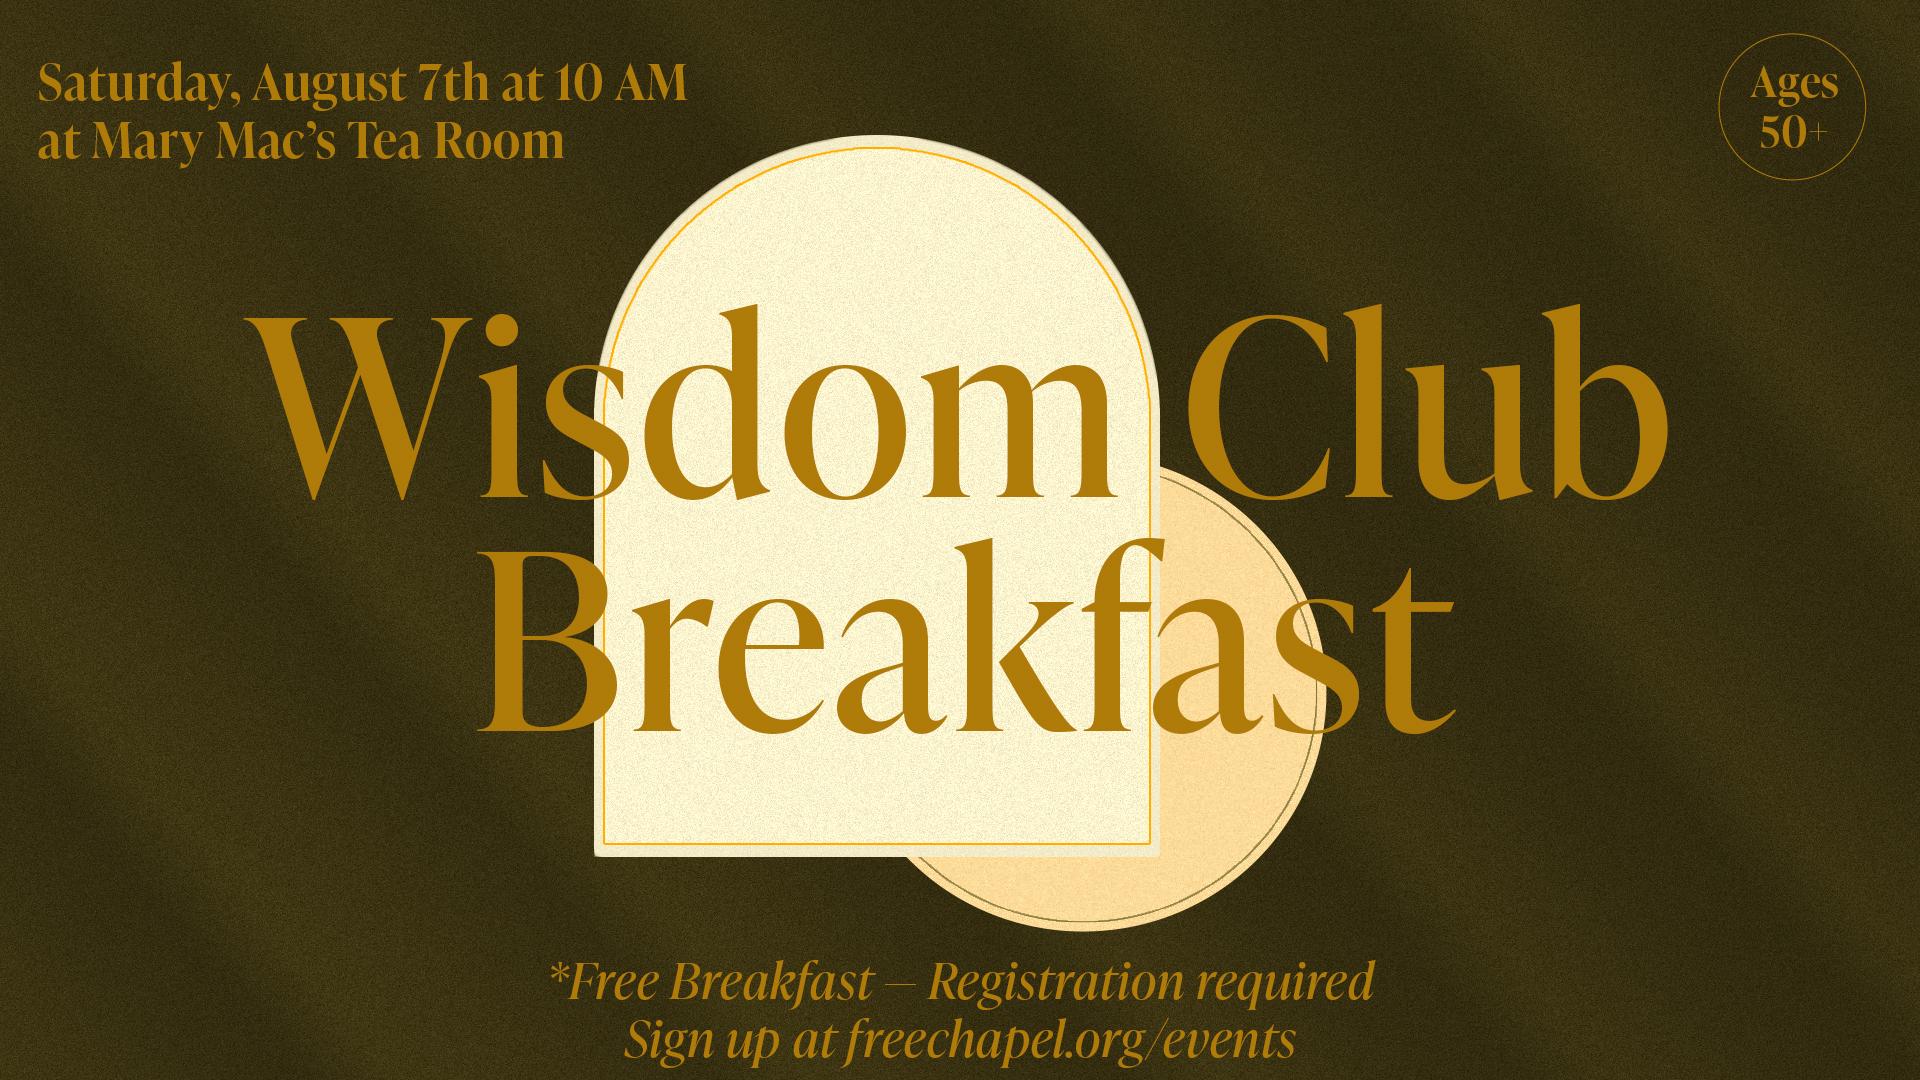 Wisdom Club Breakfast at the Midtown campus